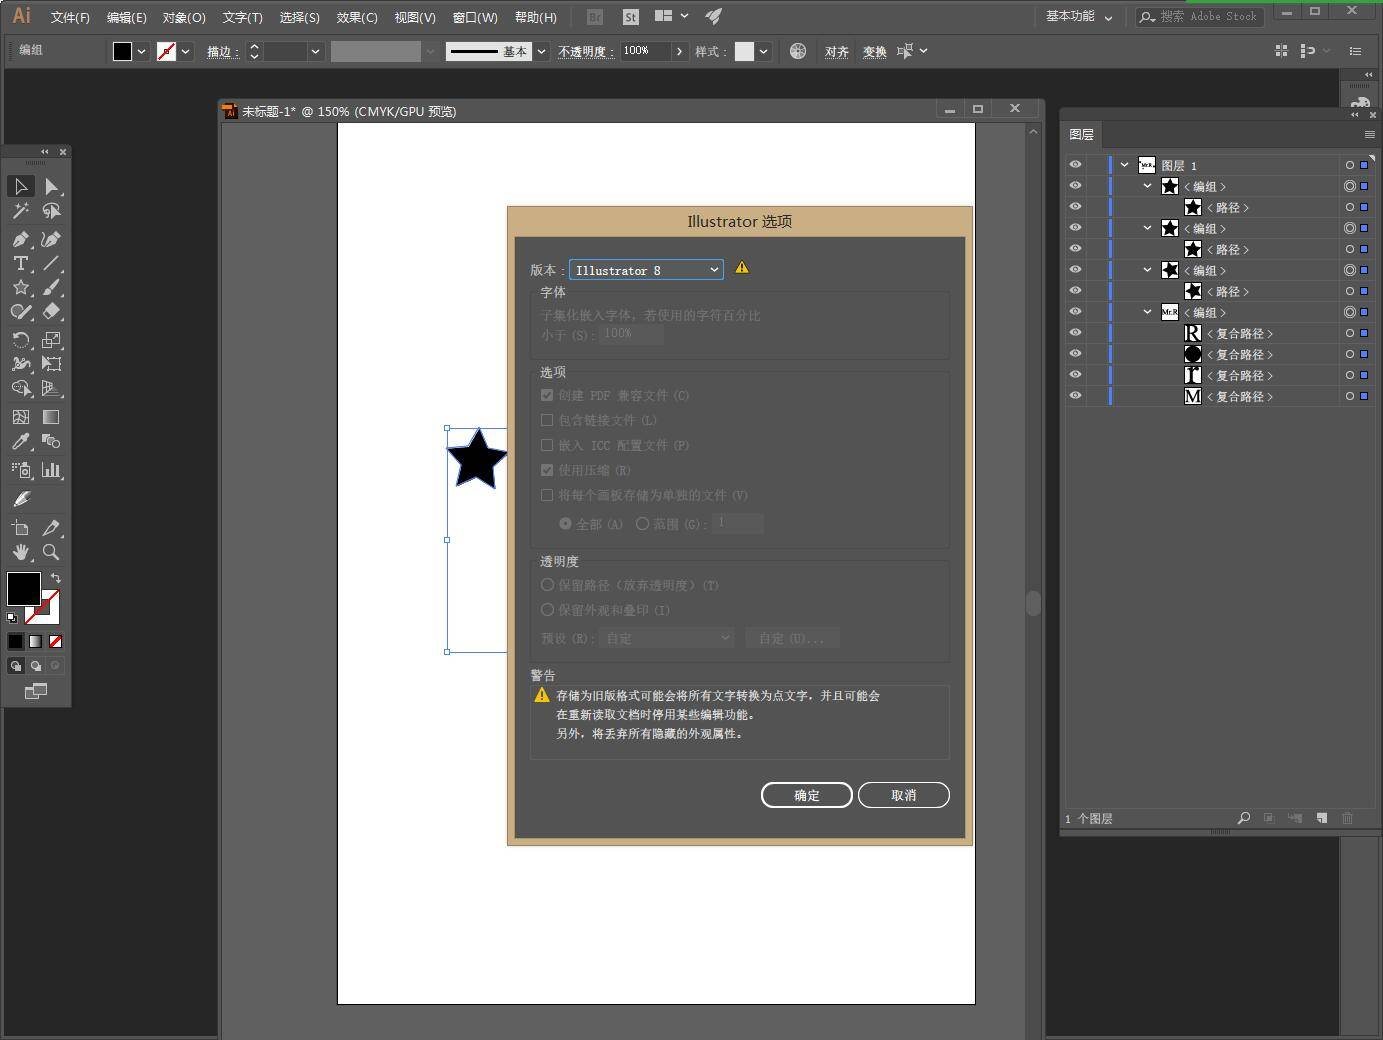 CINEMA 4D入门 (50):使用Adobe Illustrator 结合 C4D 设计 - R站|学习使我快乐! - 5